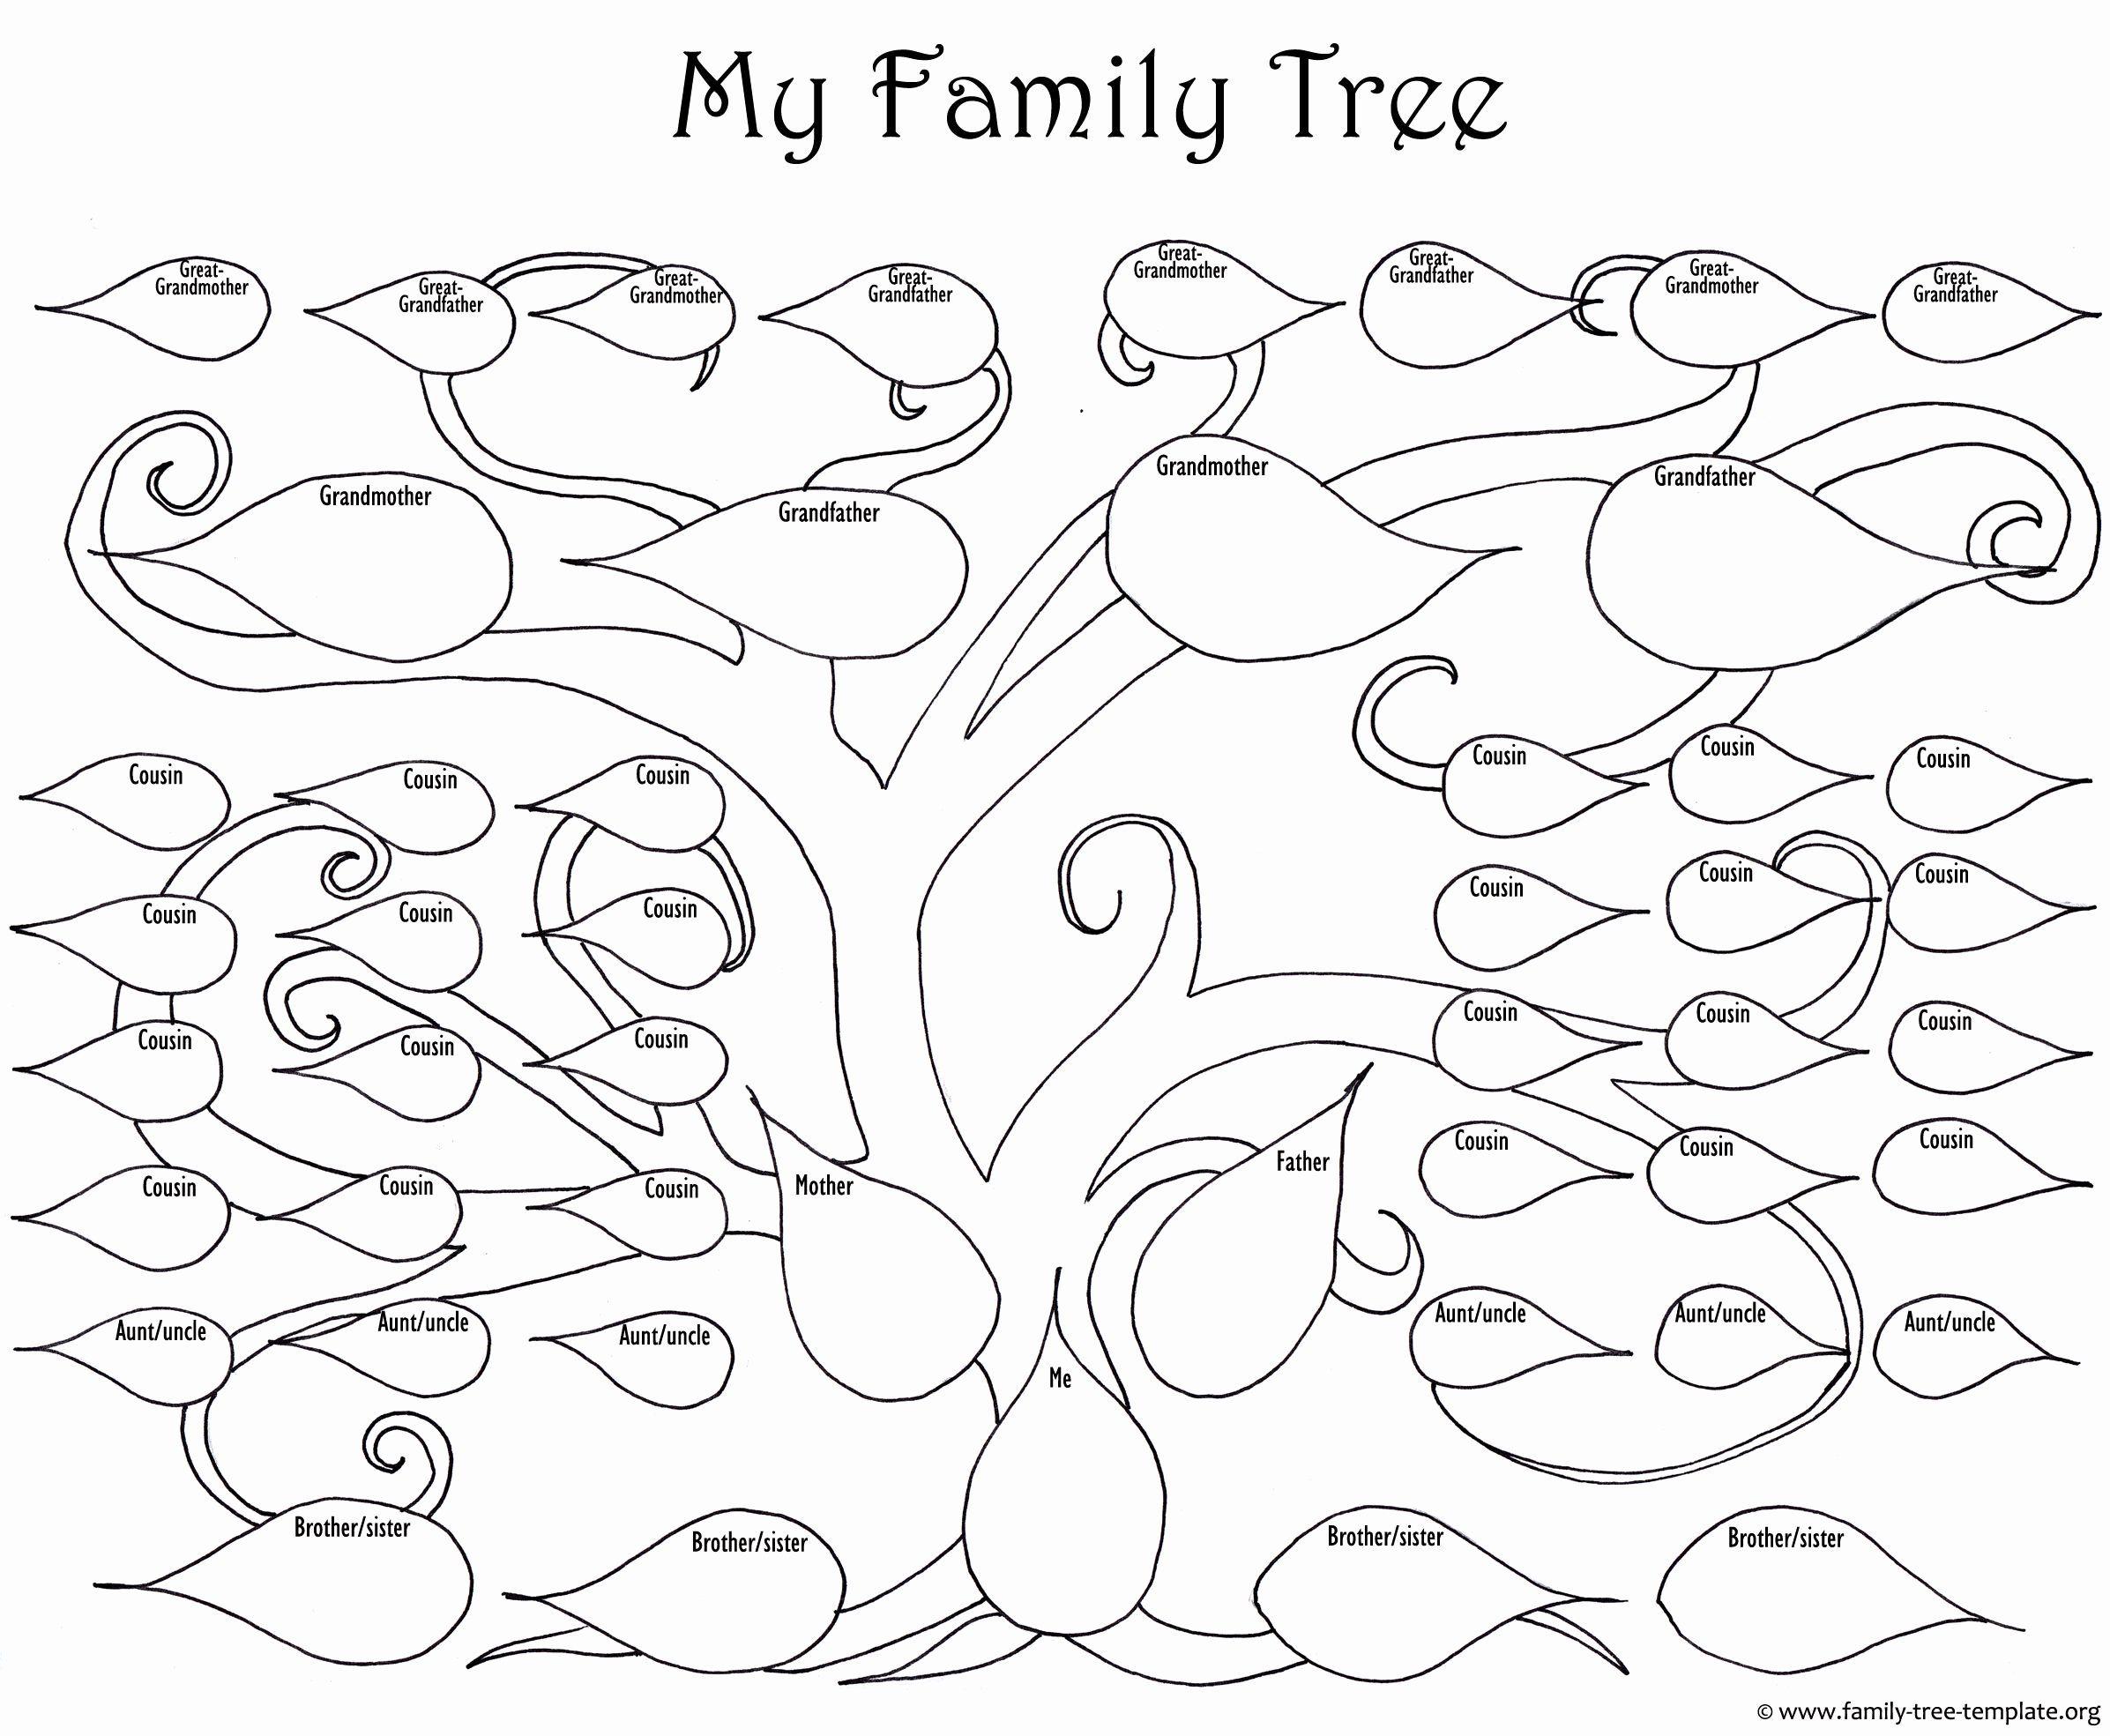 Printable Family Tree Charts Awesome A Printable Blank